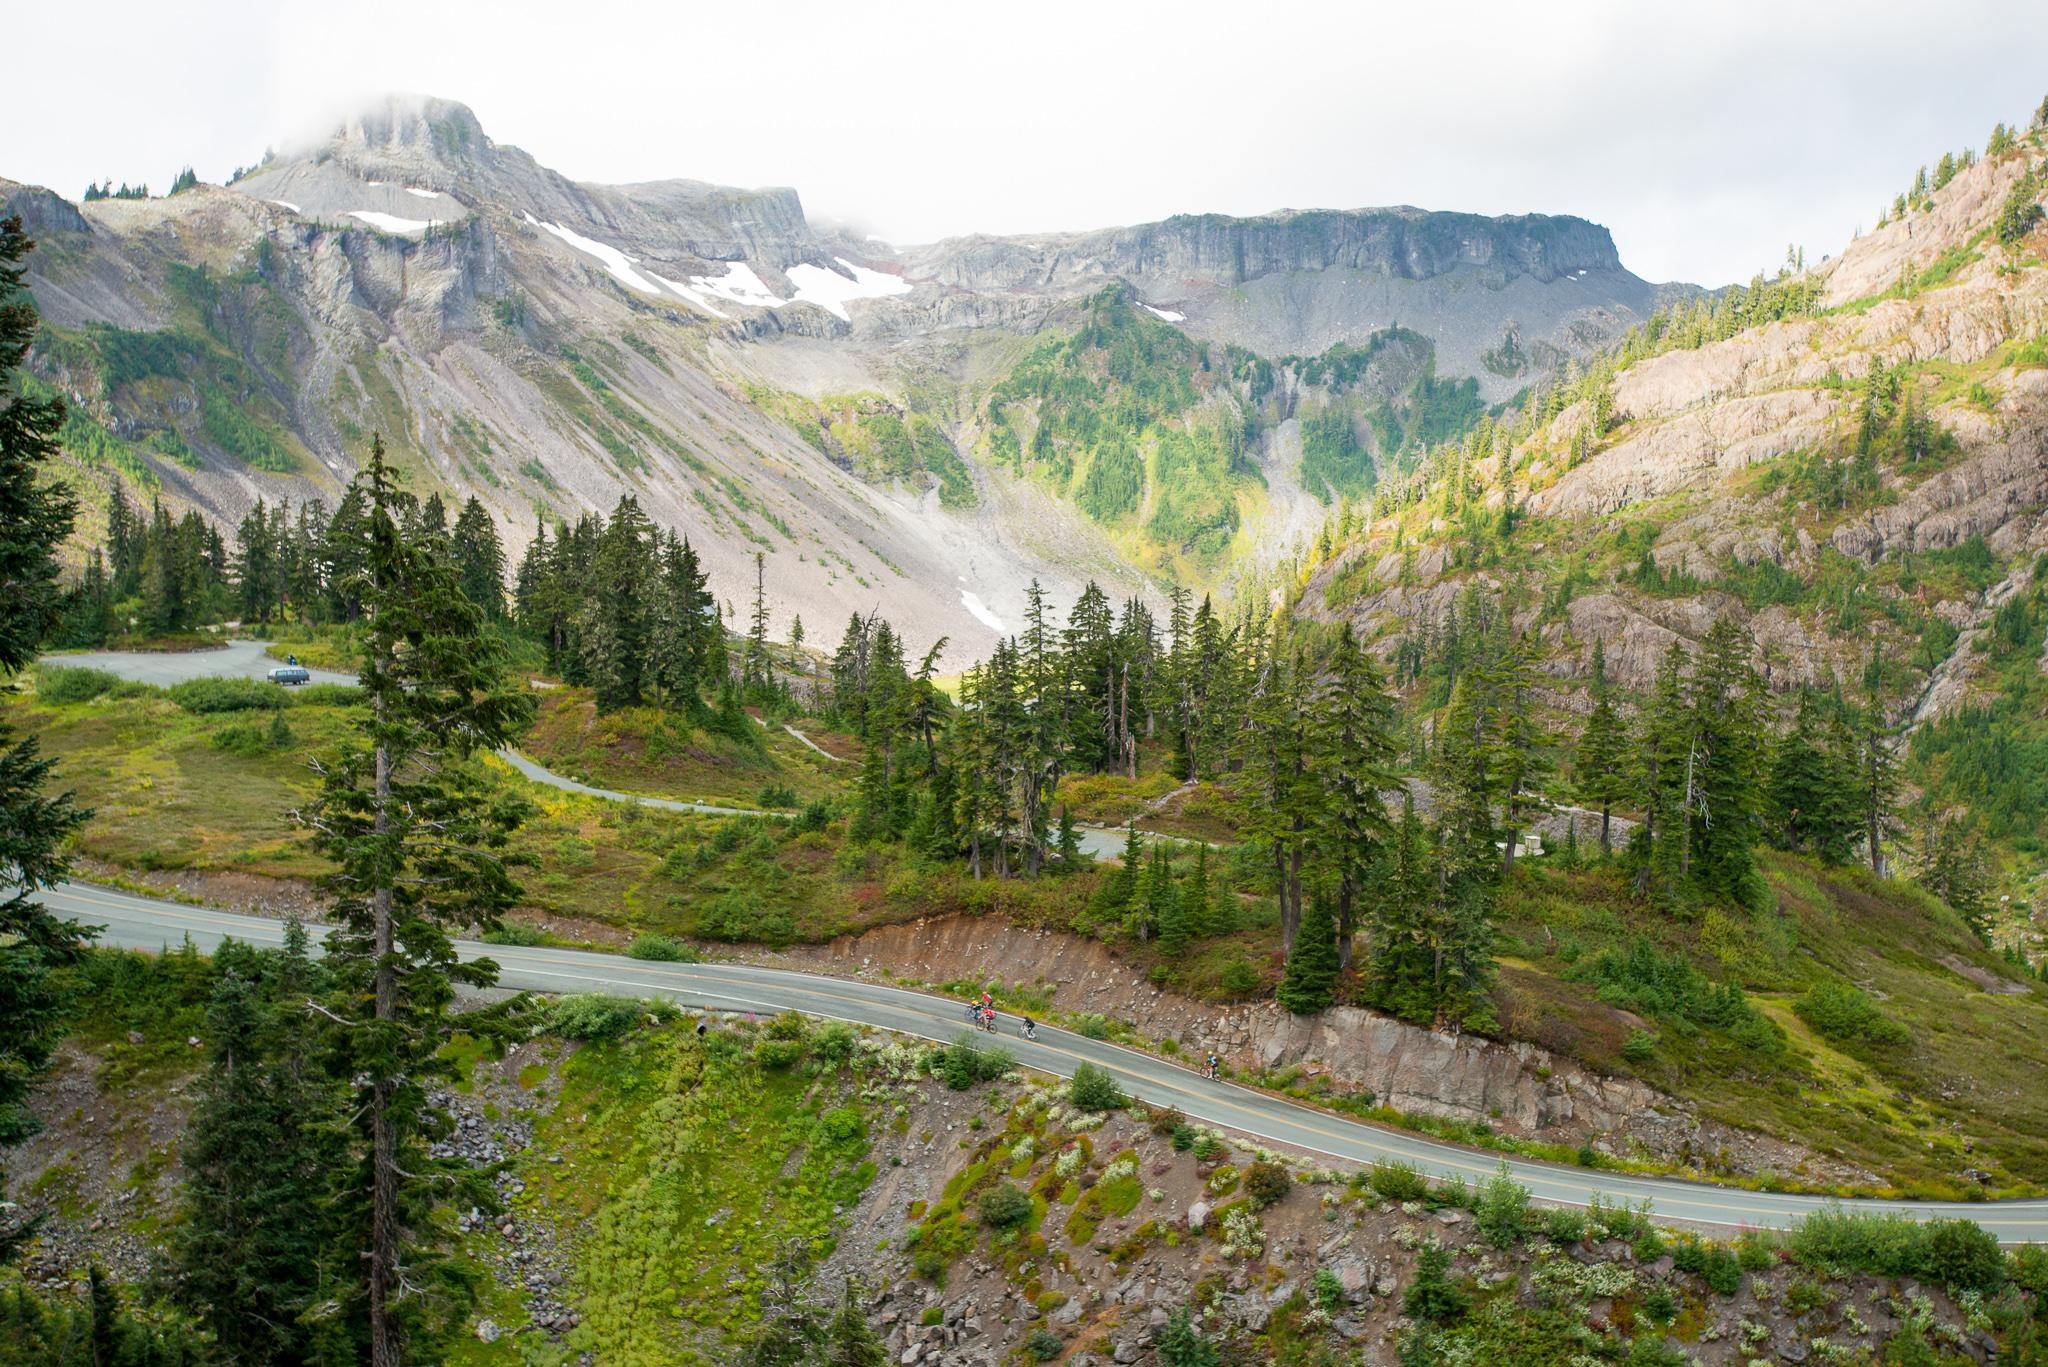 Sunday, Sept 8th - Mt. Baker Hillclimb